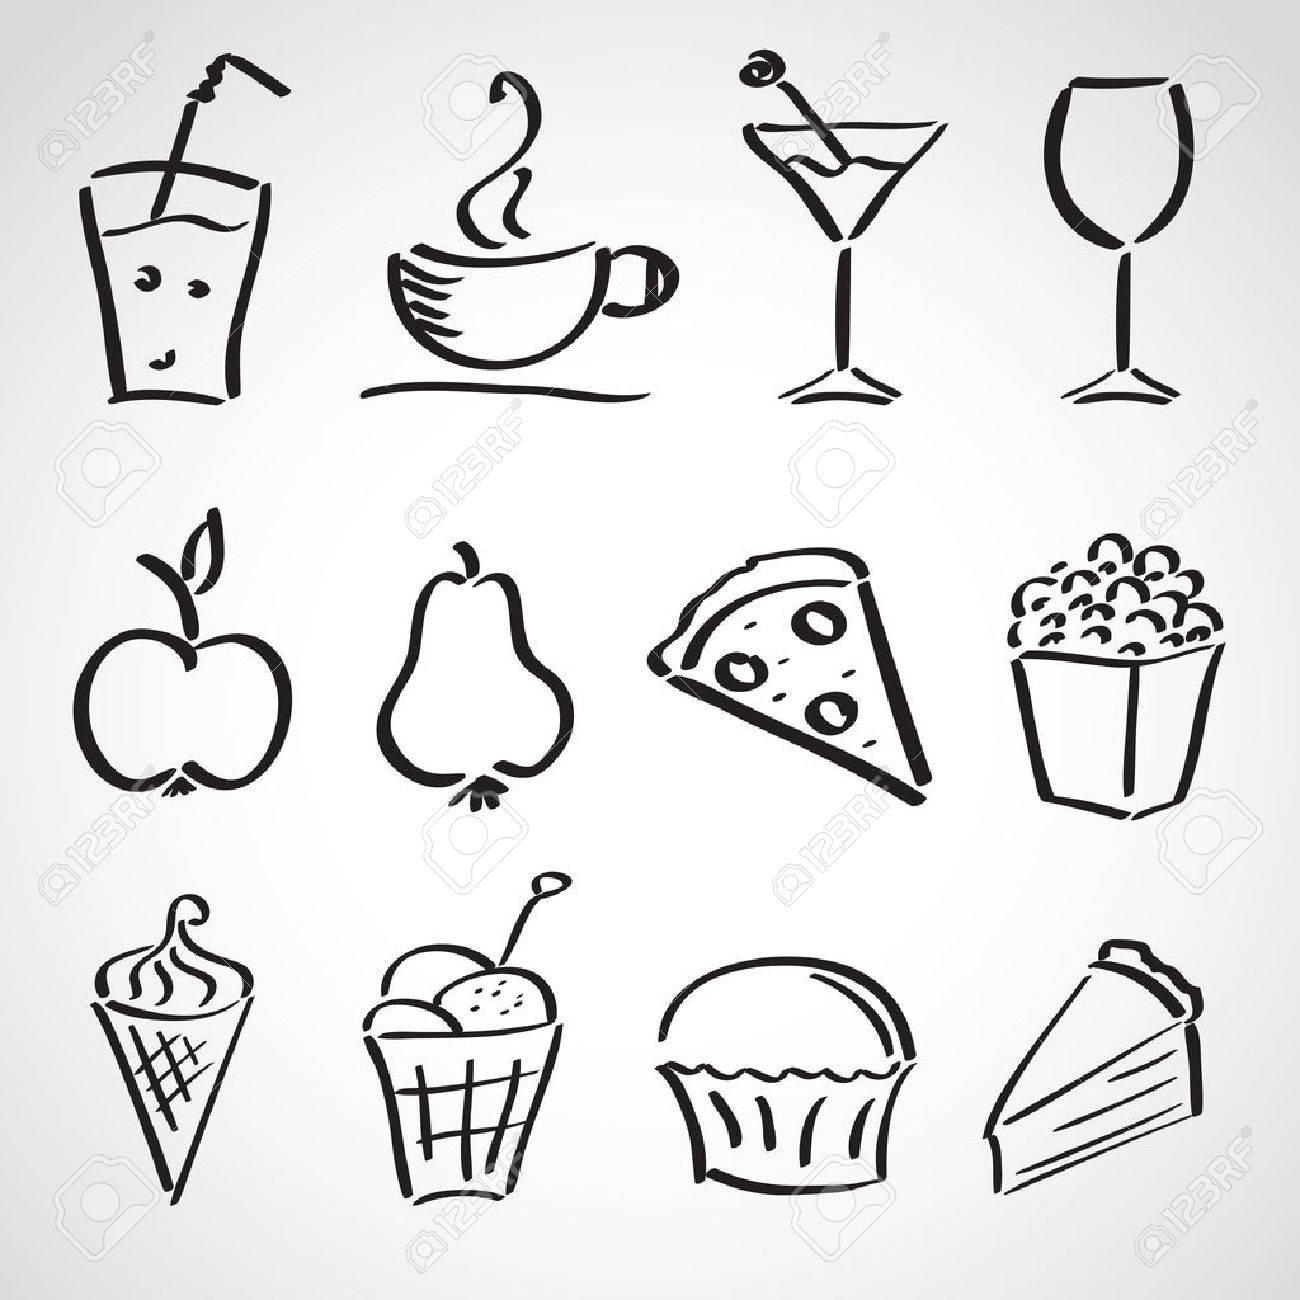 Ink style hand drawn sketch set - food, drinks, ice cream - 23545370